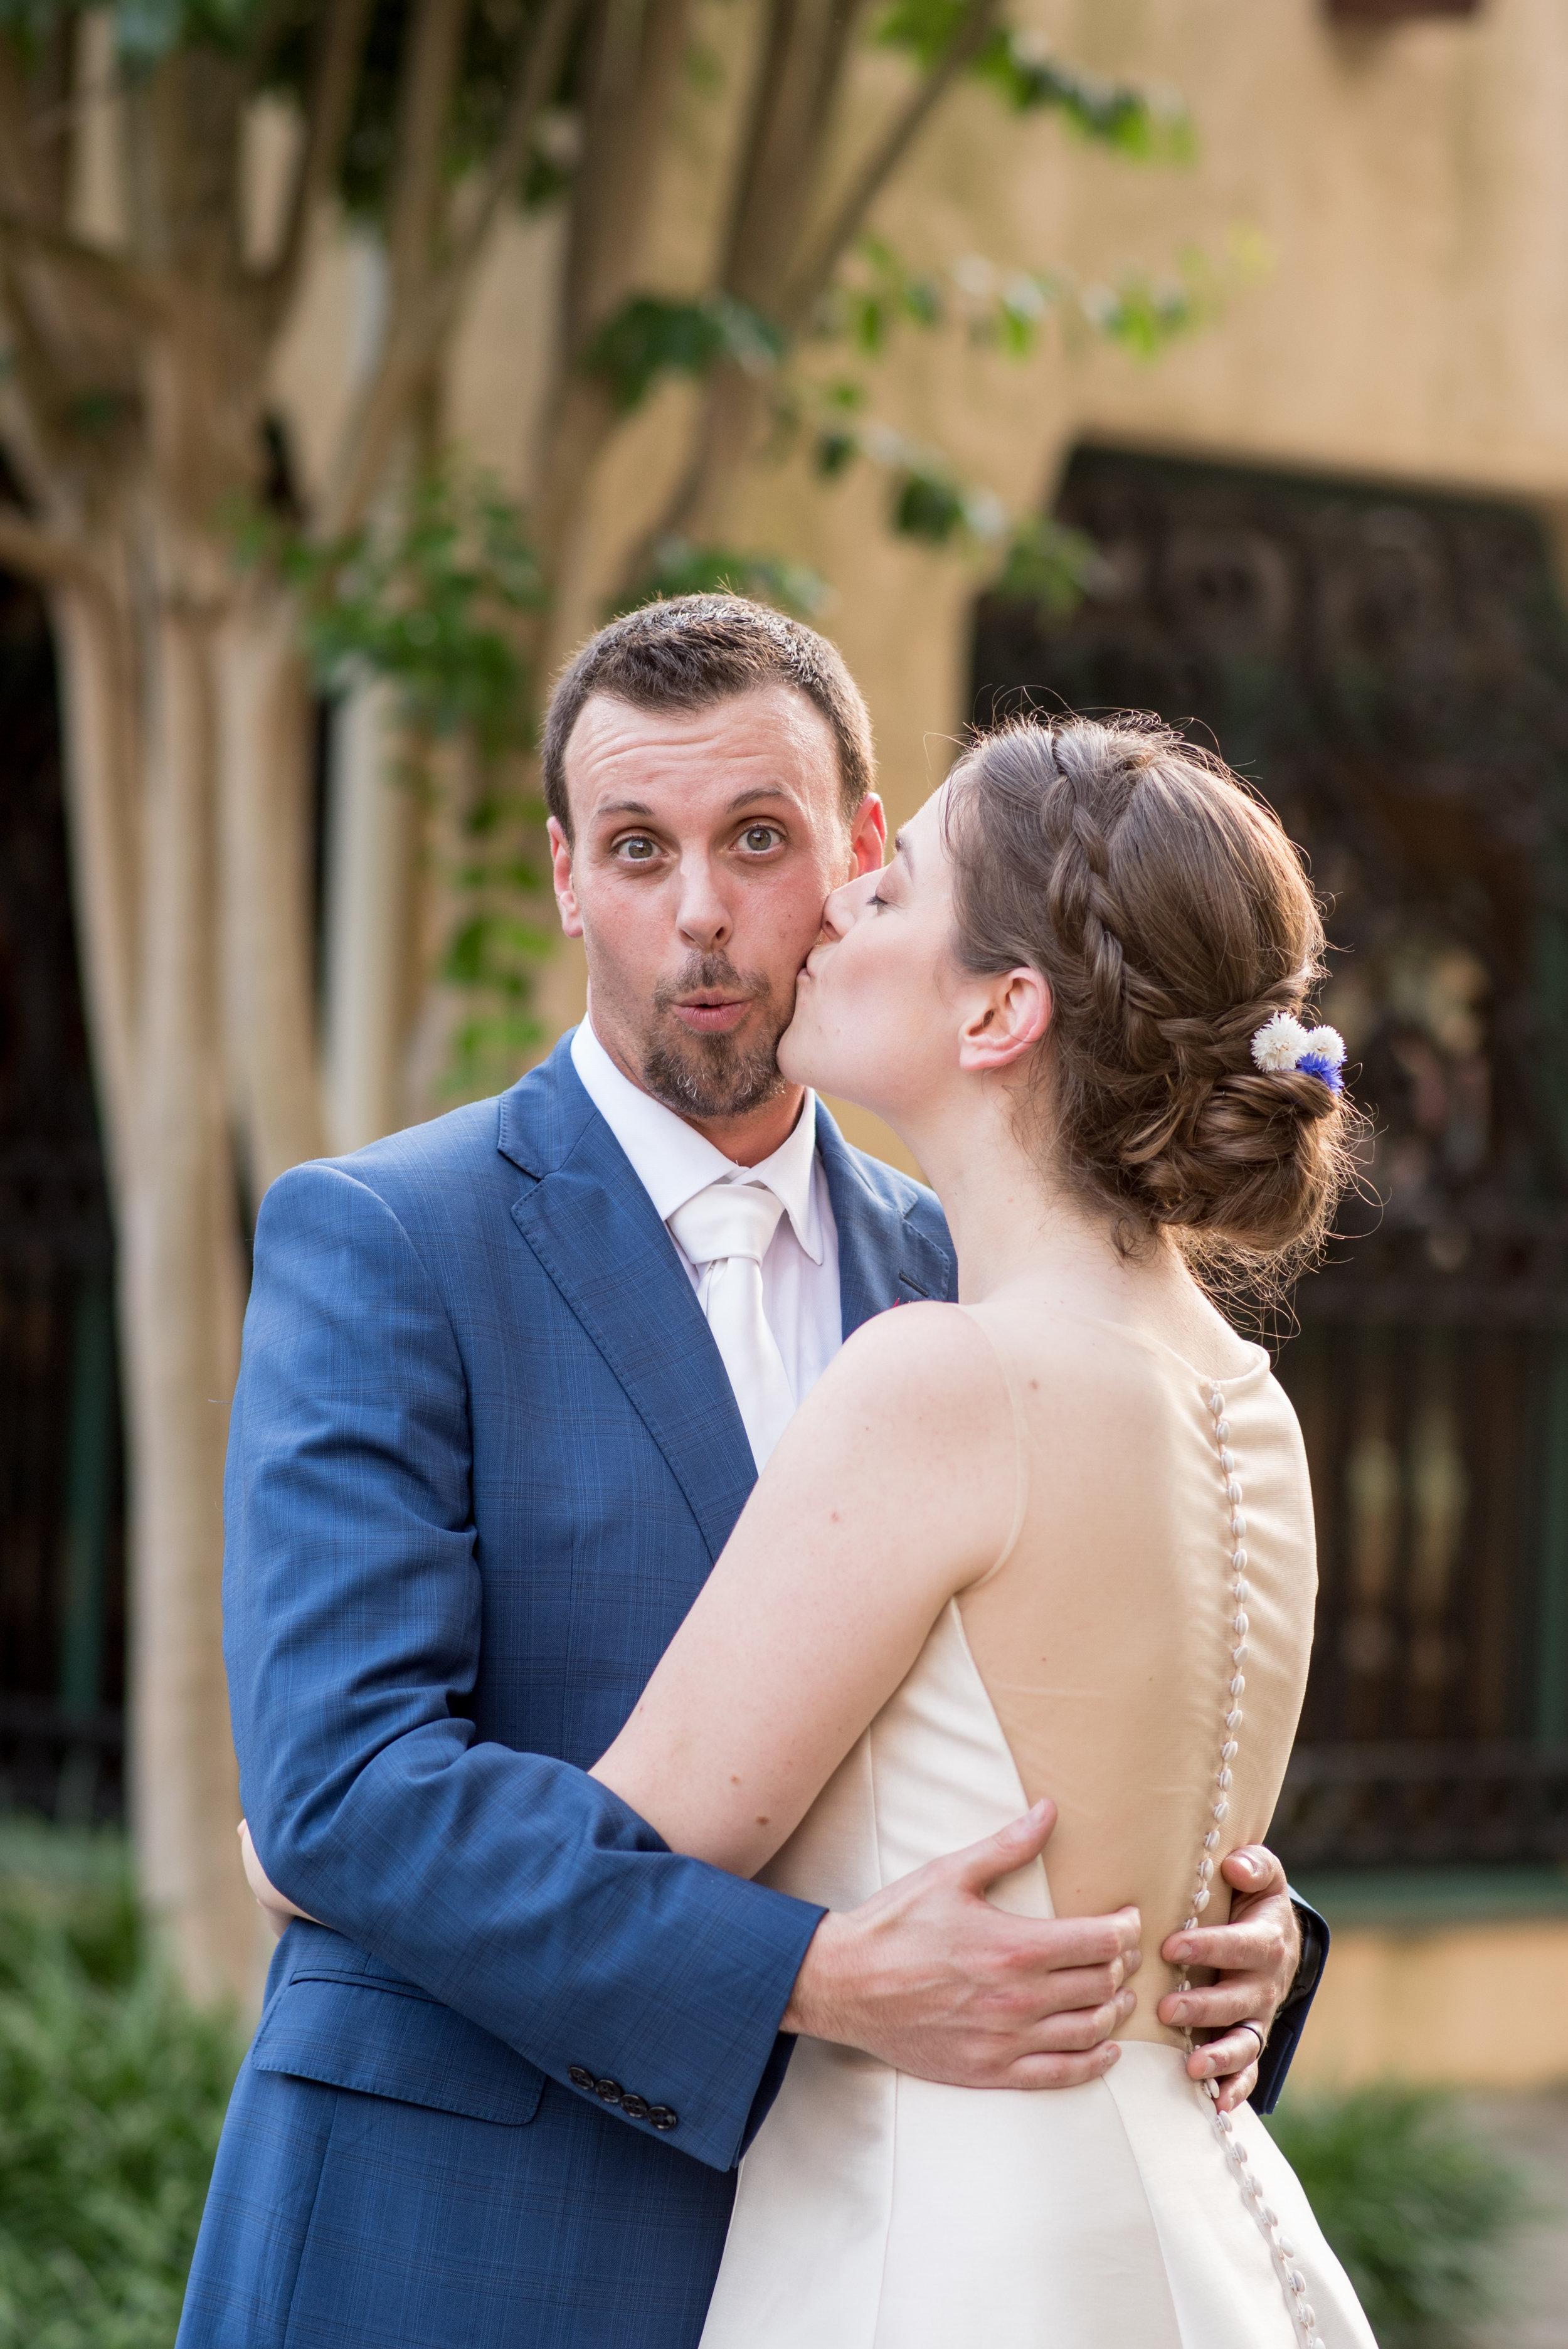 T & L wedding- bride&groom portraits (38).jpg